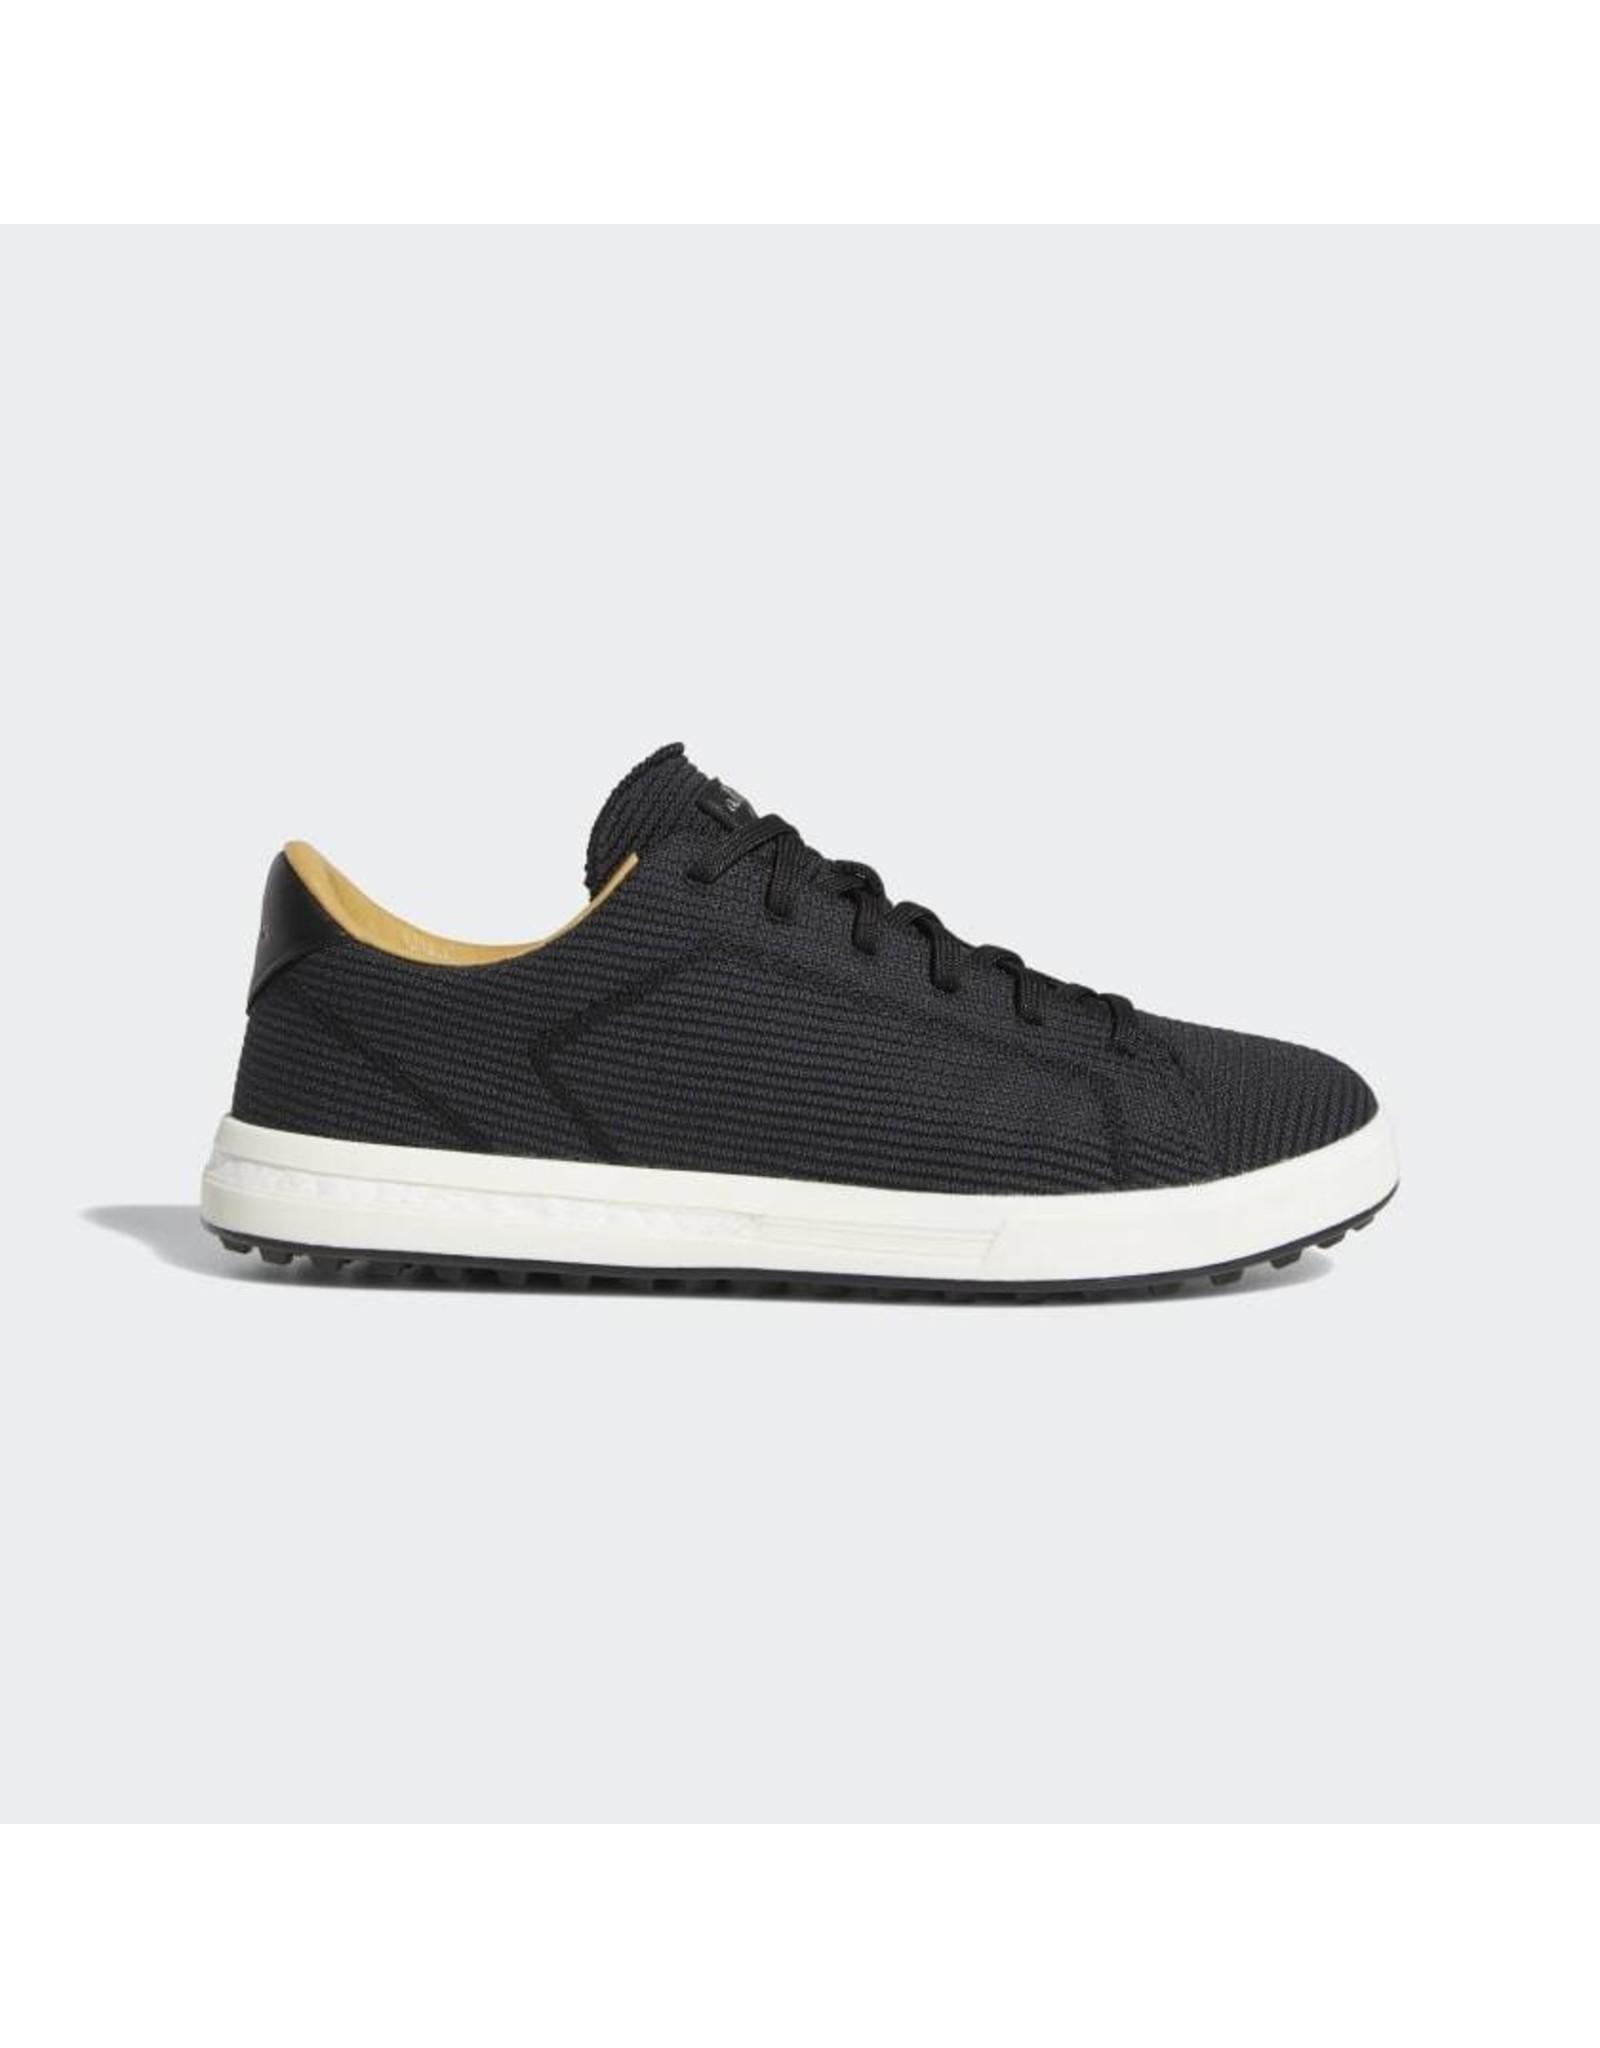 Adidas Adidas Adipure Black